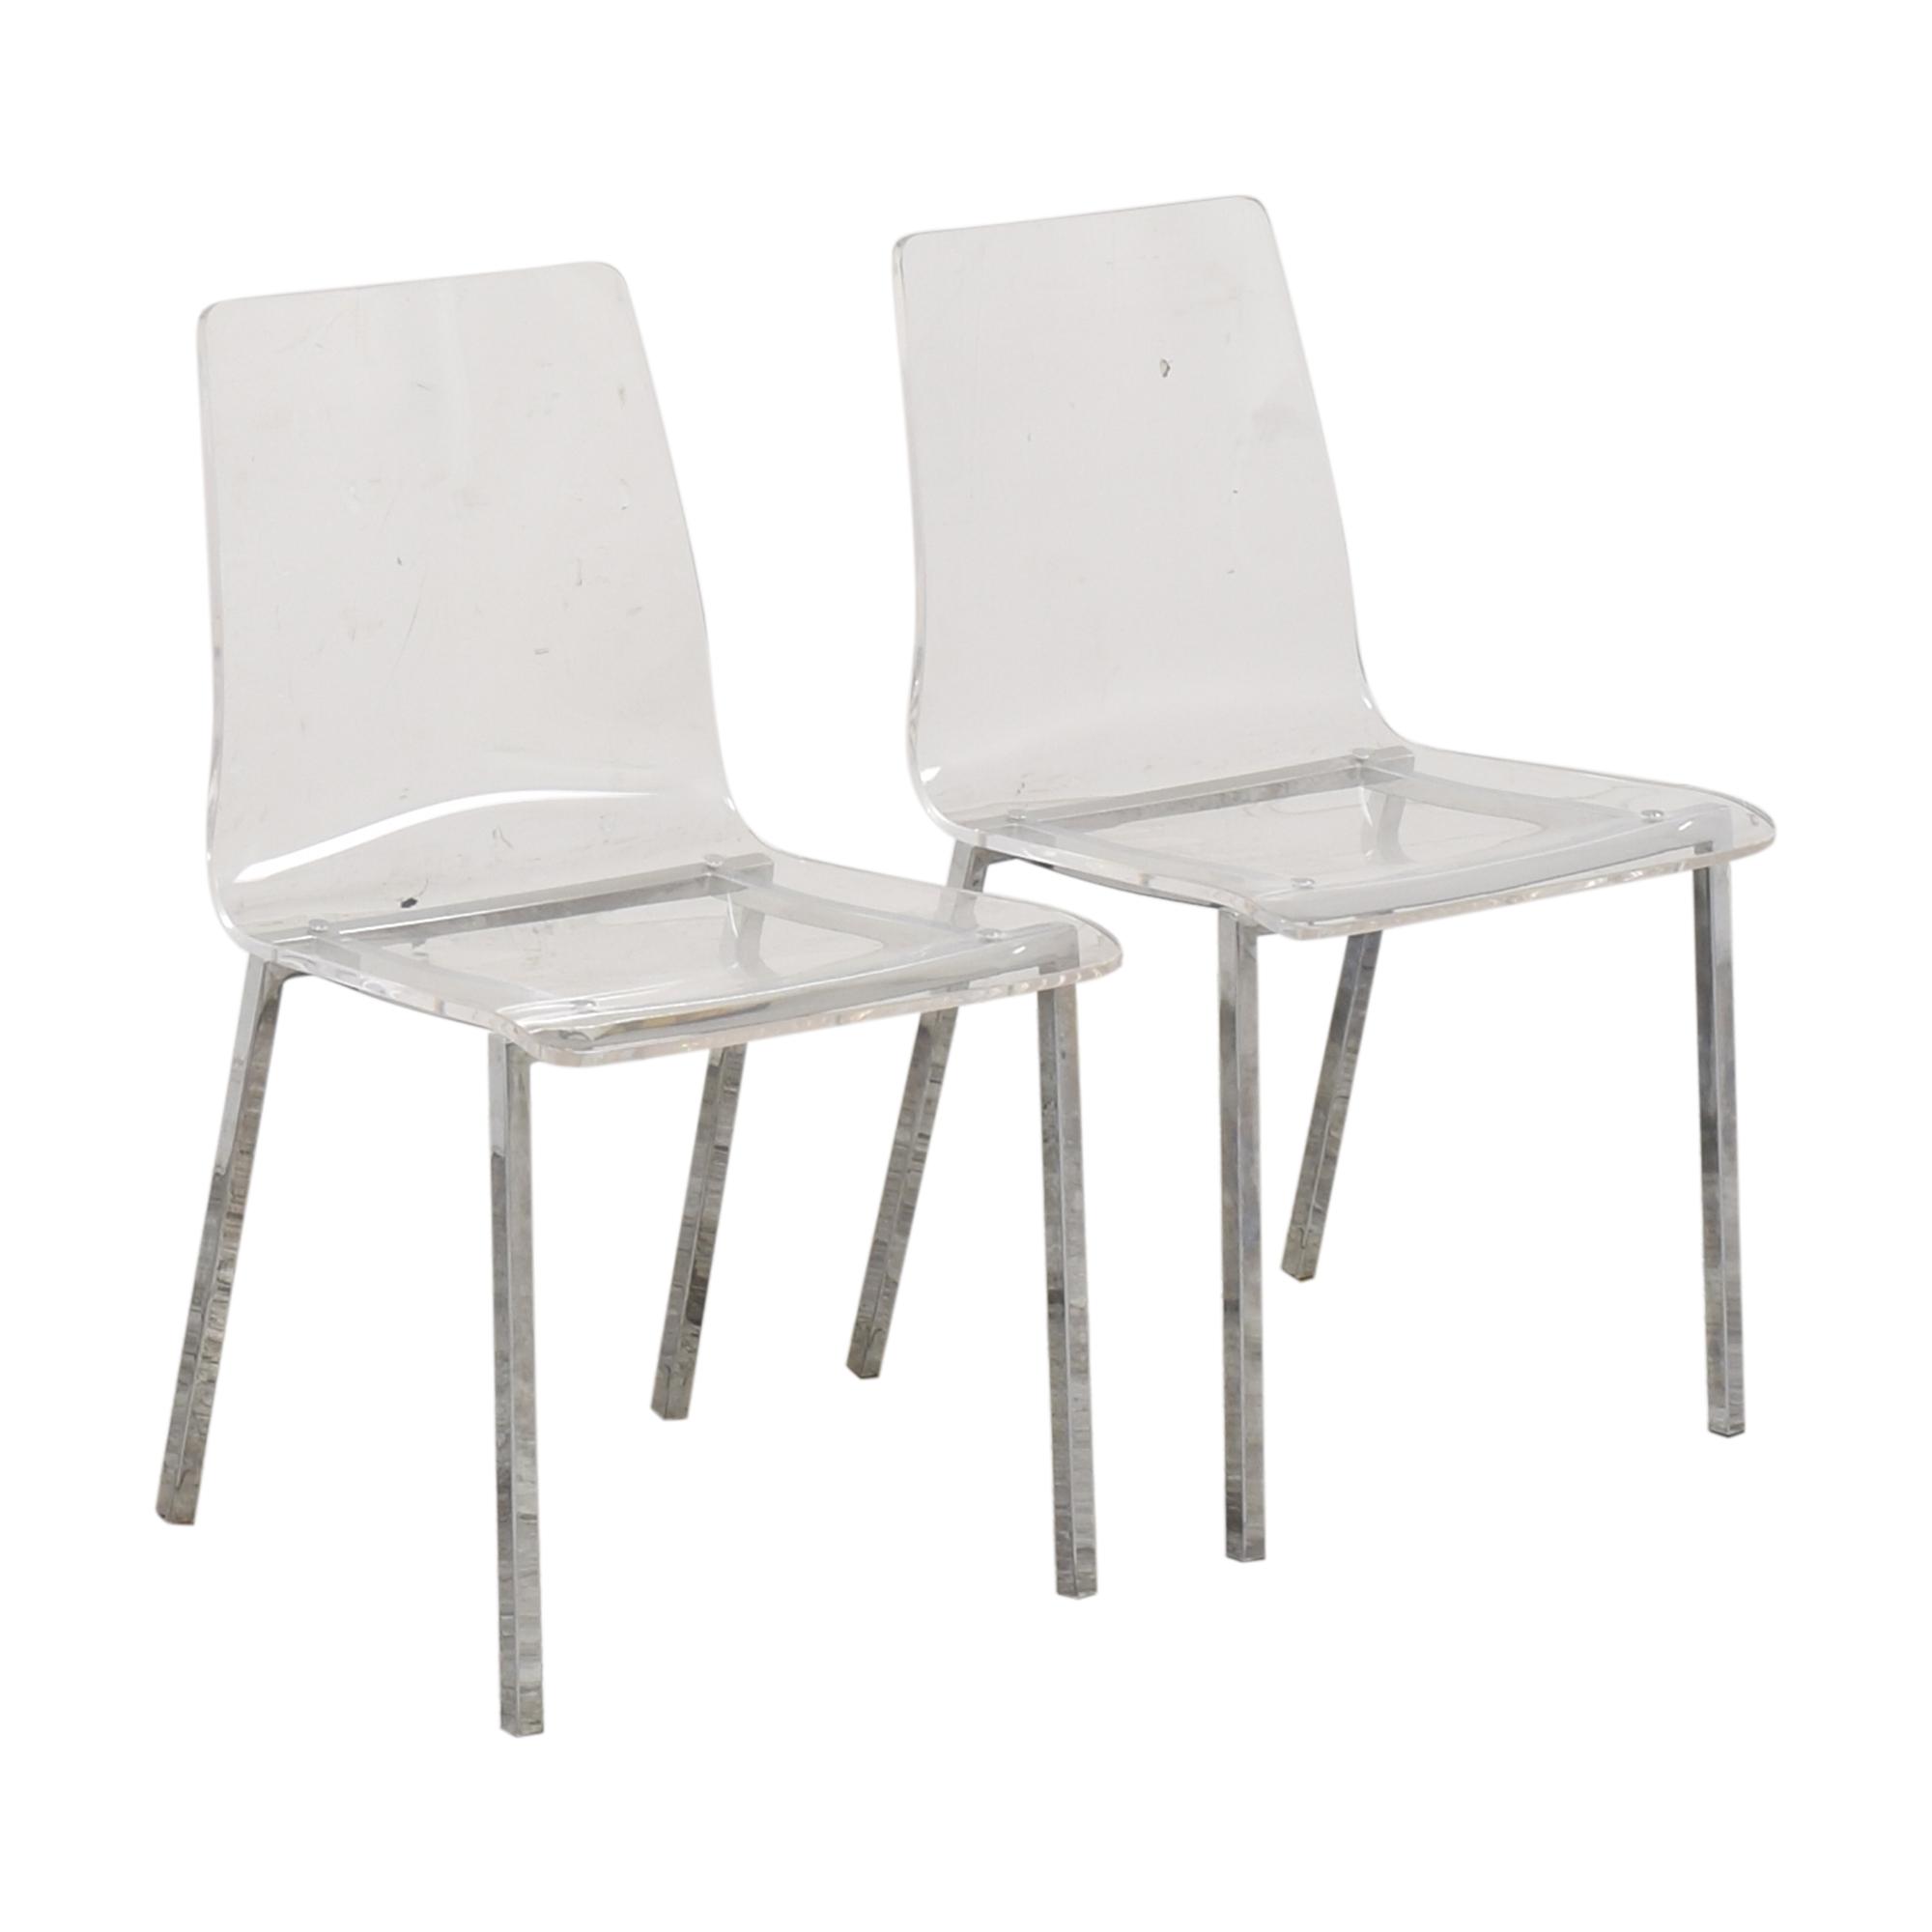 CB2 CB2 Vapor Acrylic Clear Dining Room Chairs price